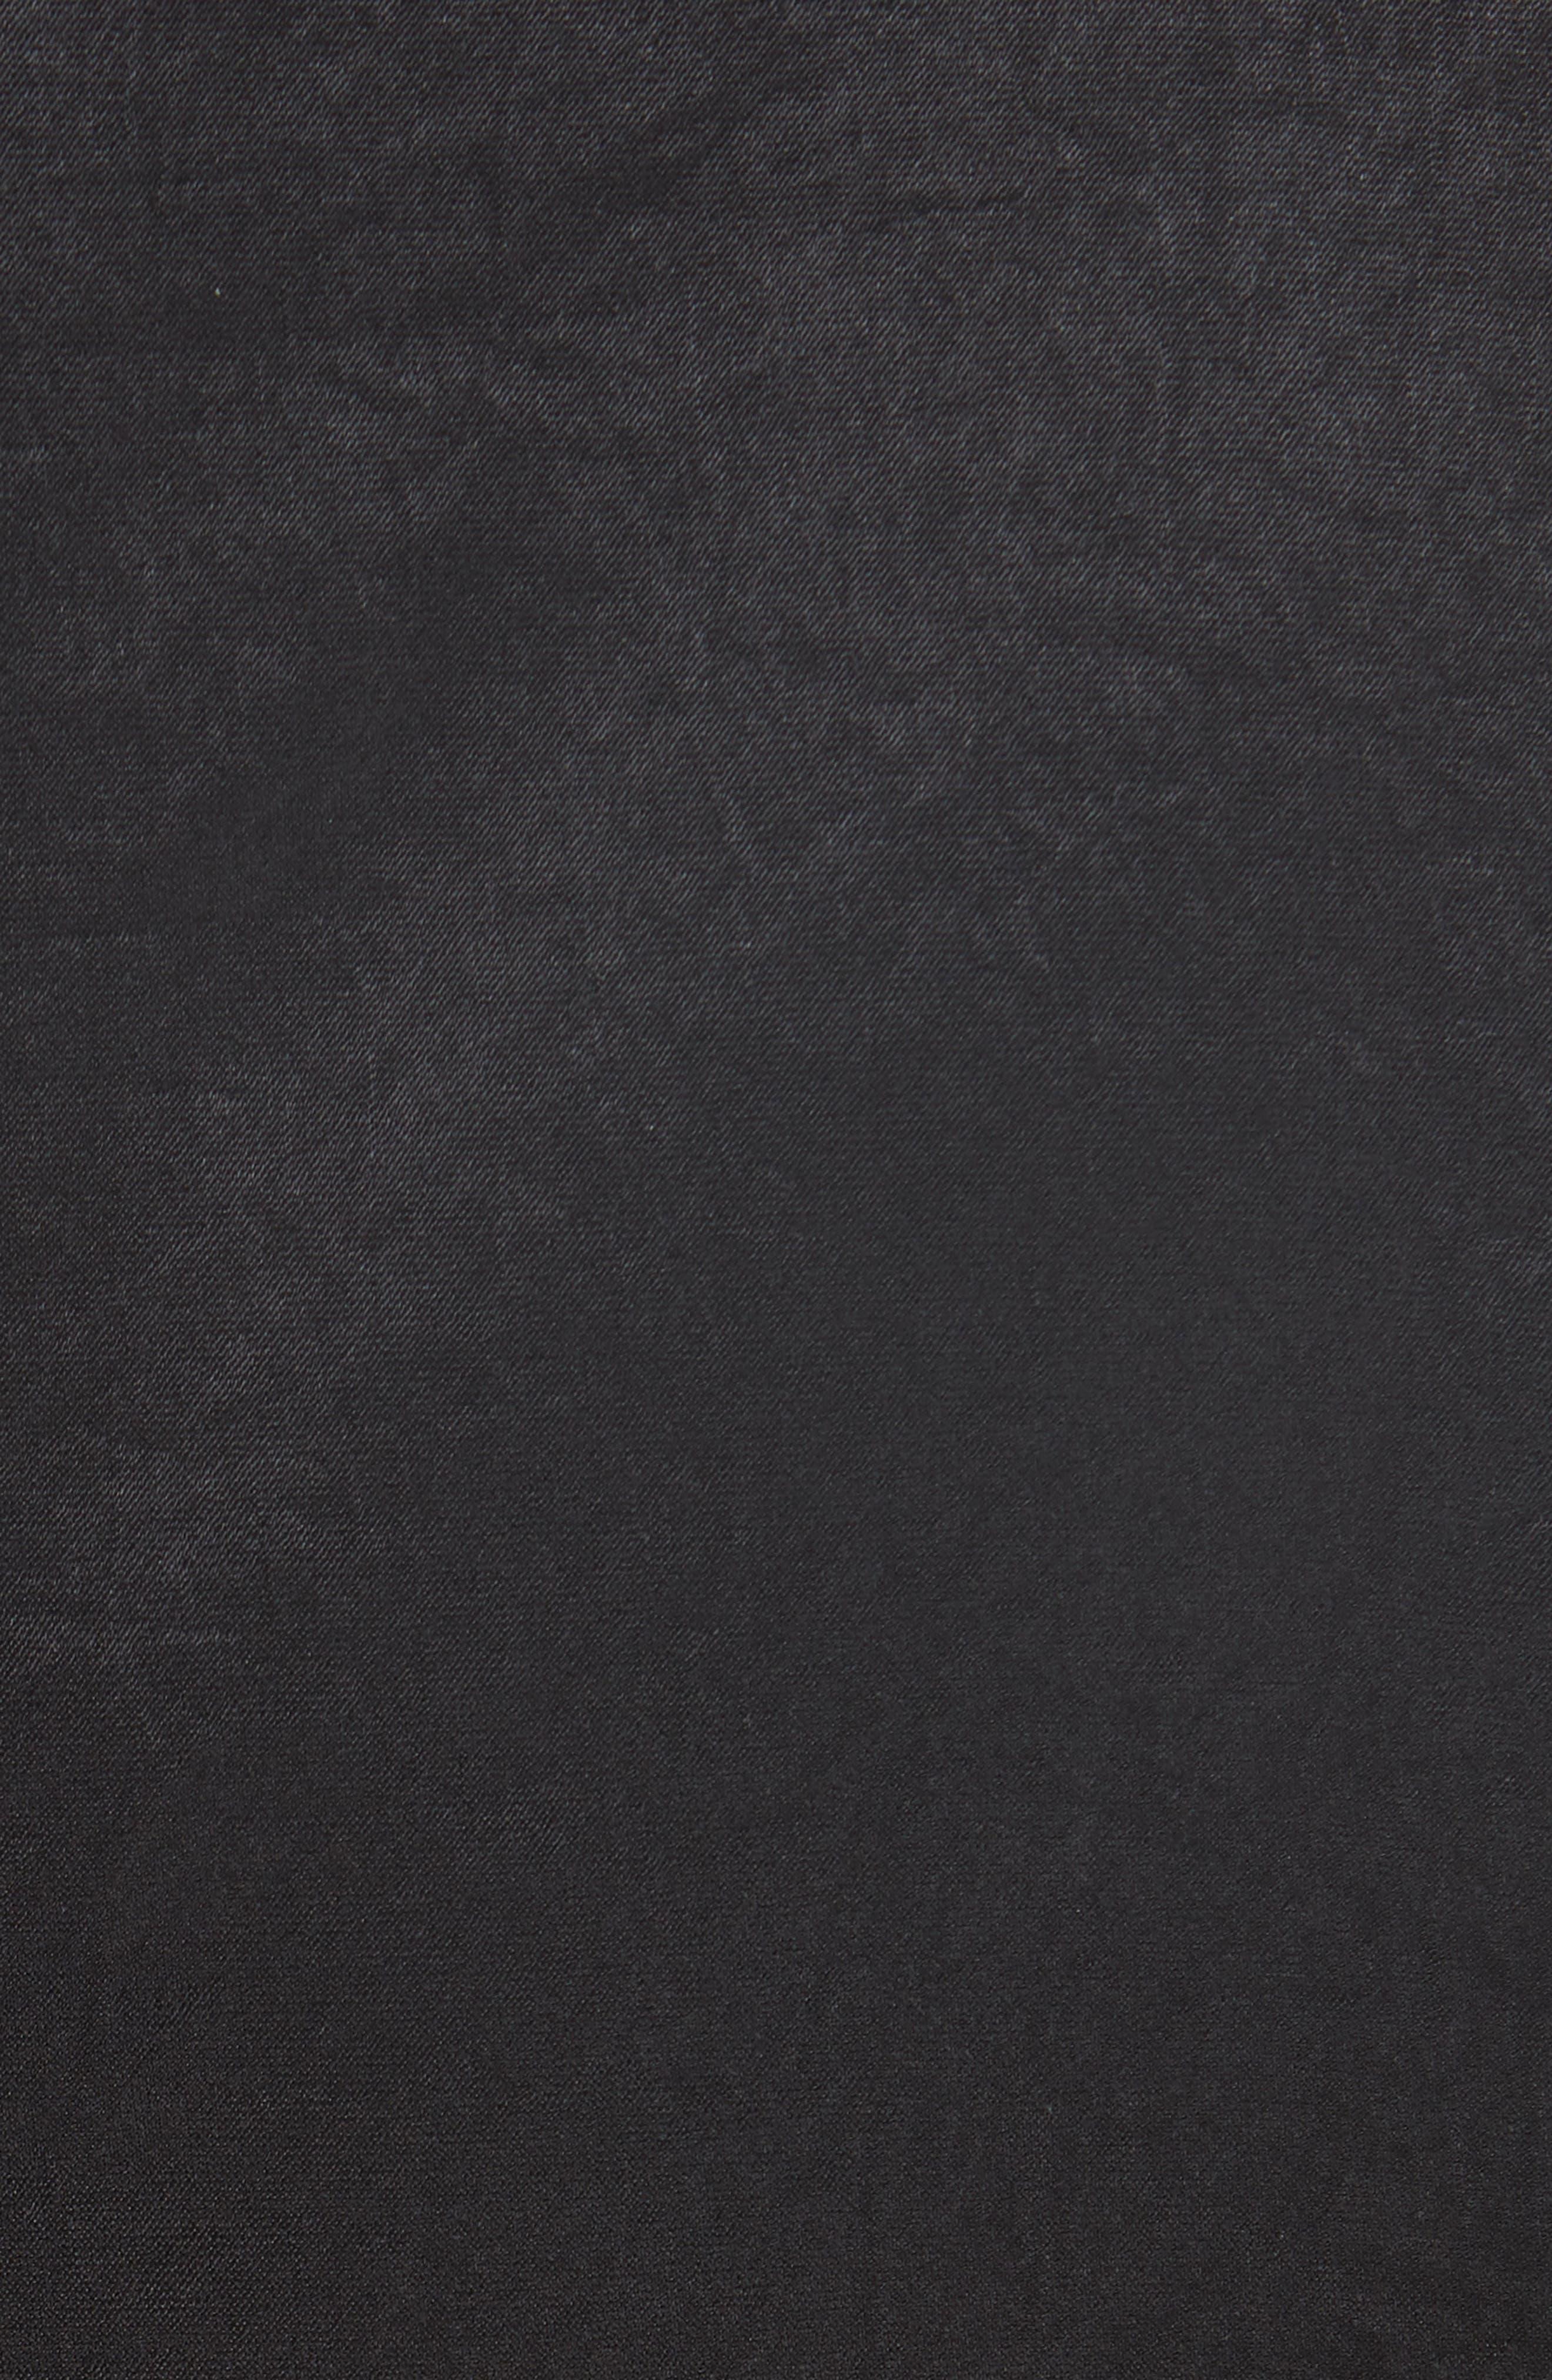 Ruched Crinkle Satin Dress,                             Alternate thumbnail 6, color,                             001